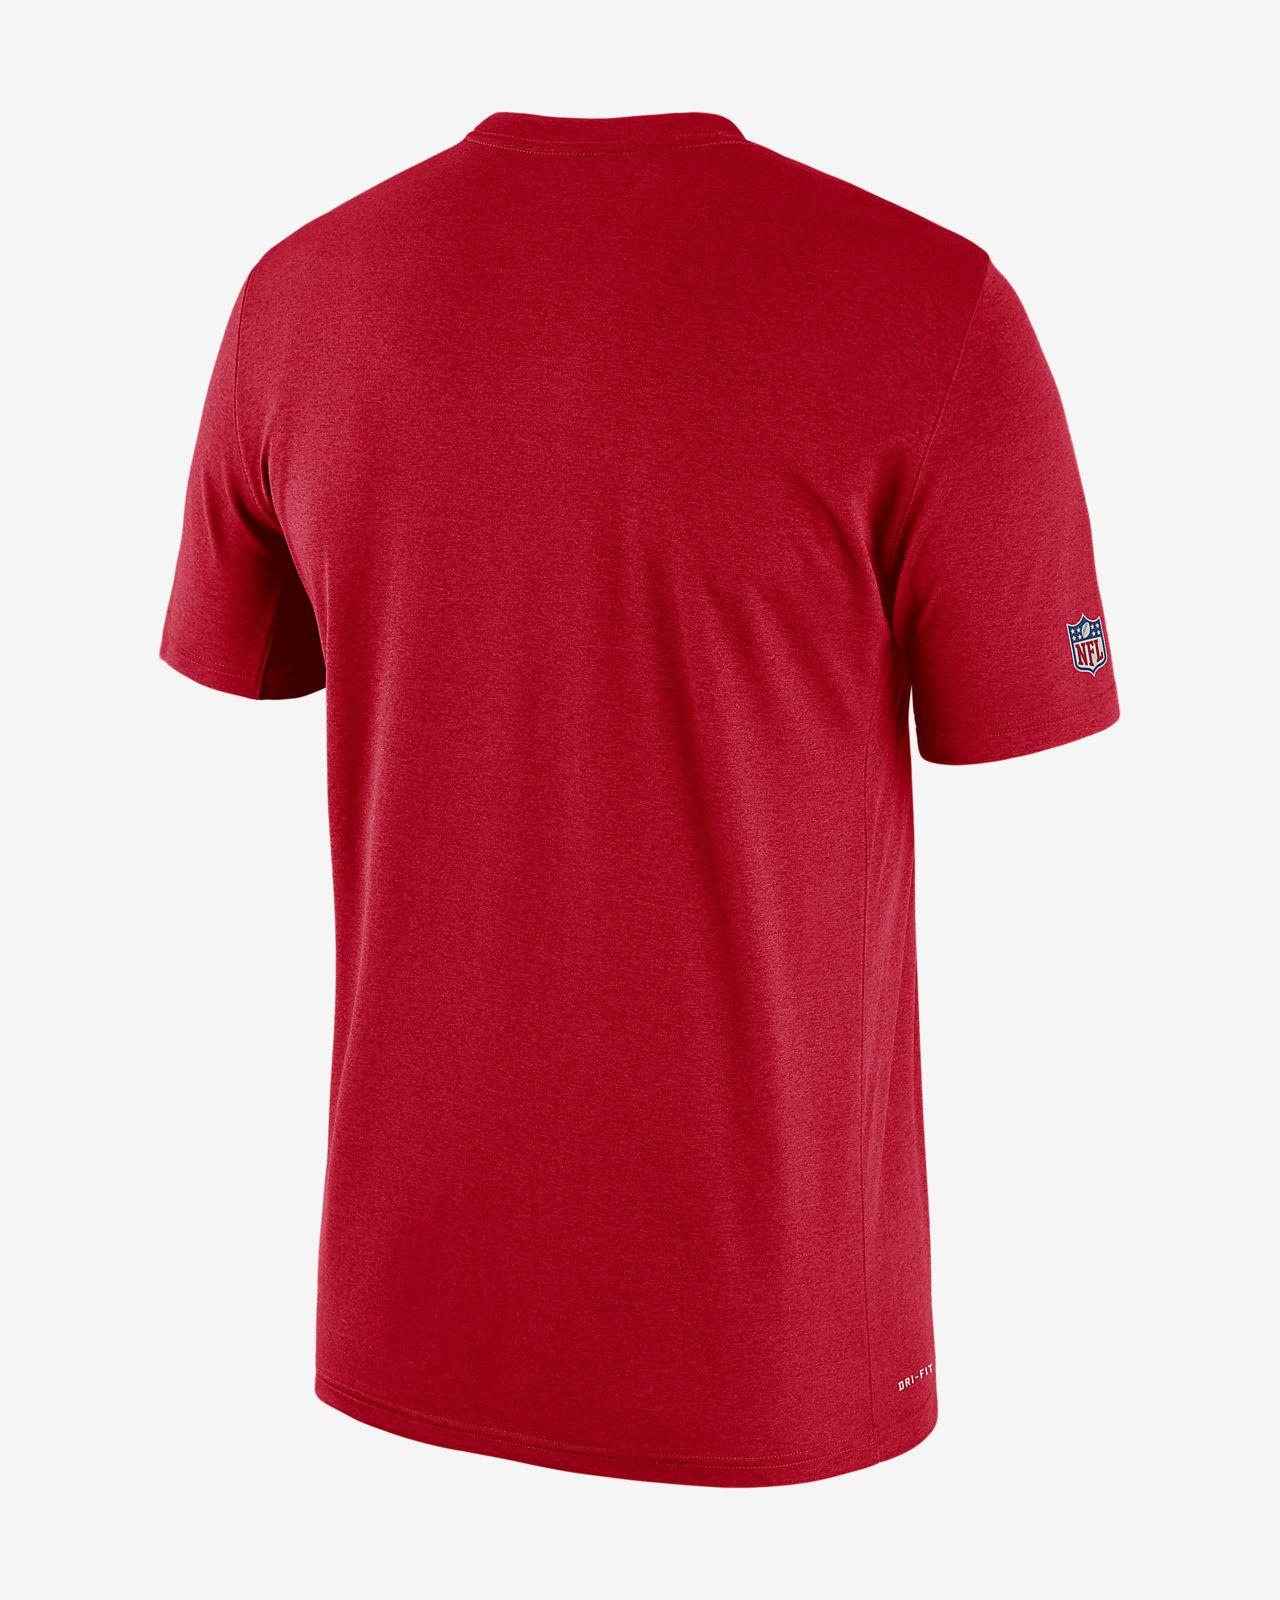 cd138c227a68e Nike Dri-FIT Legend Seismic (NFL Buccaneers) Men's T-Shirt. Nike.com